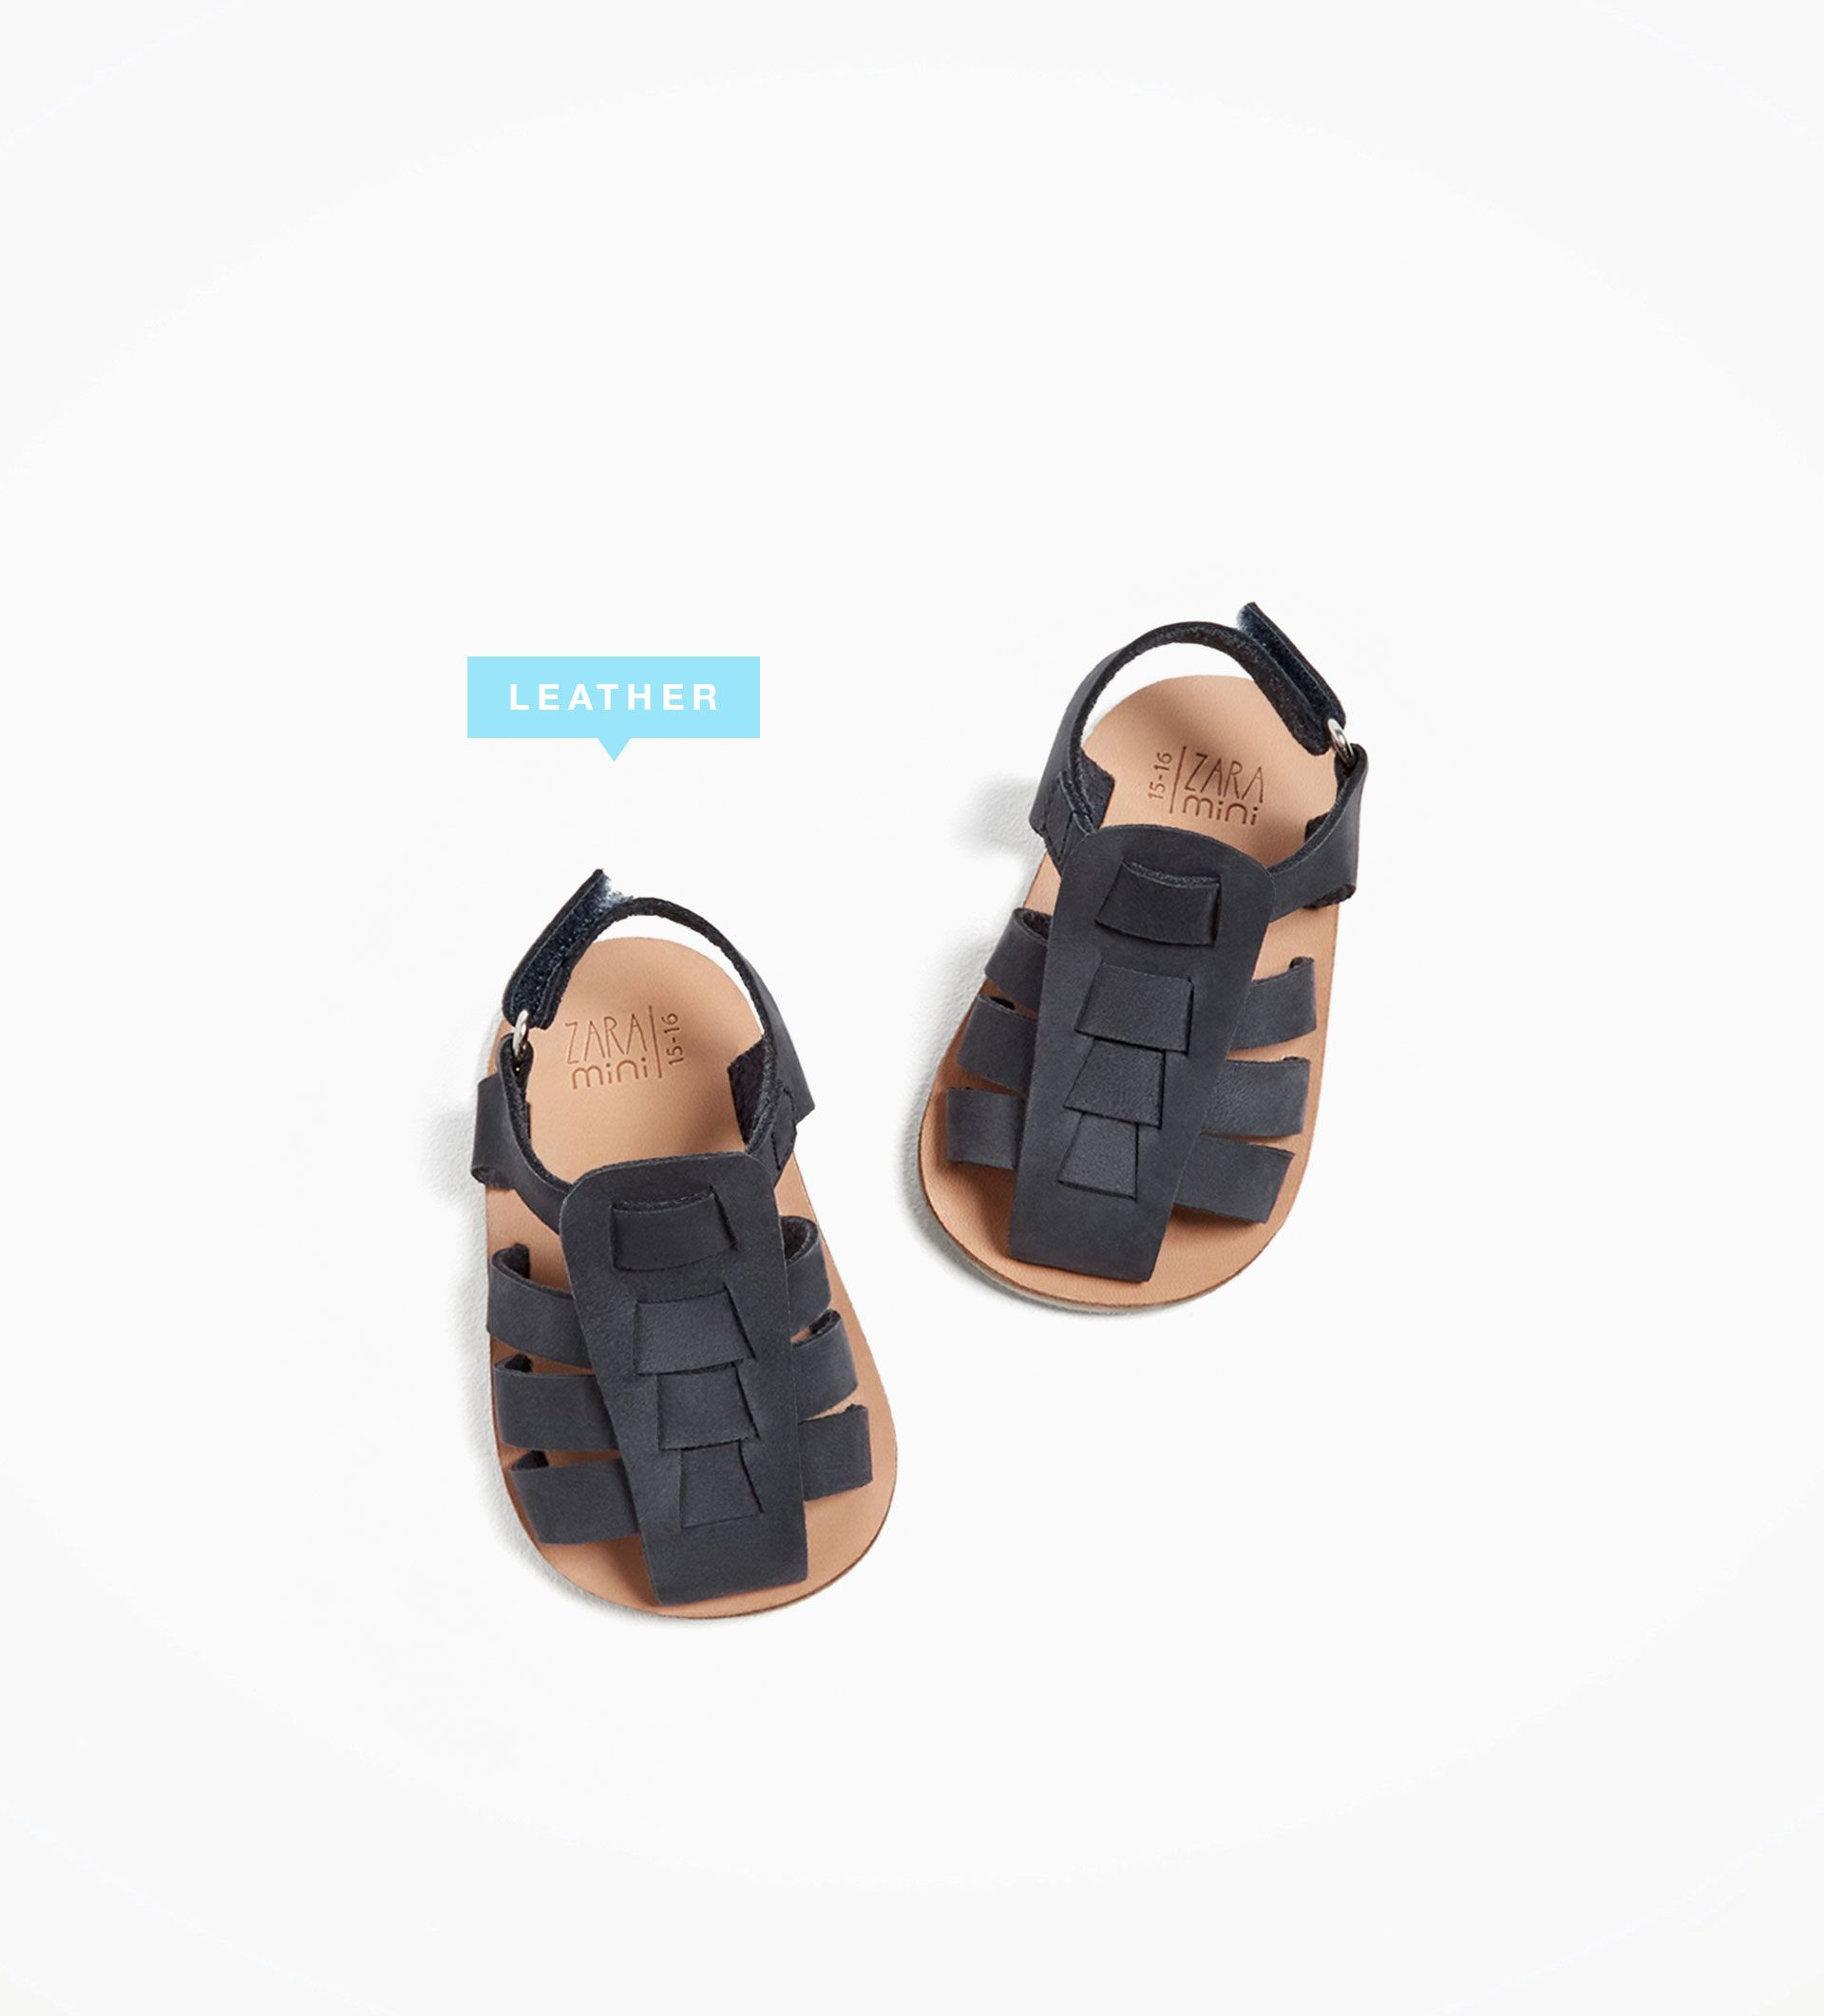 Cuir Cuir chaussure Sandale Sandale Meduse Meduse Cuir Pk8wOn0X